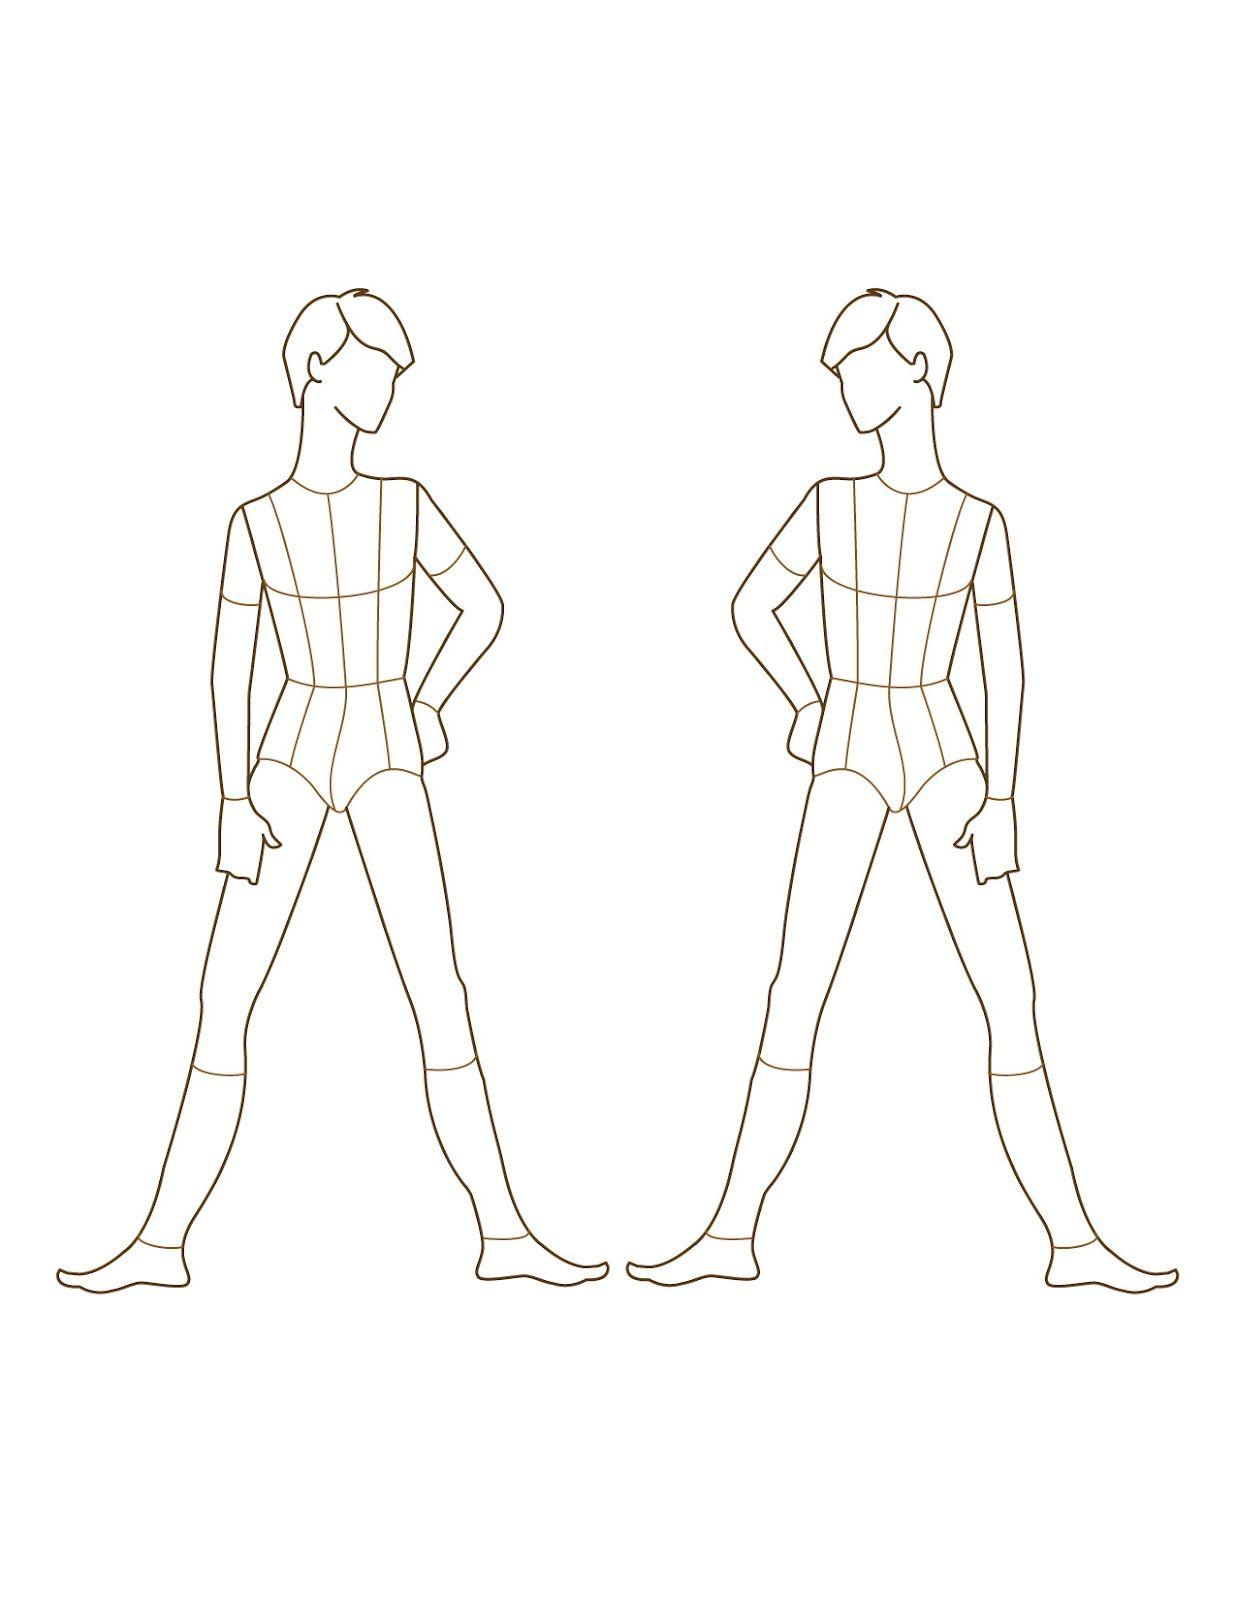 915c1f1aaf5 Female fashion figure croqui